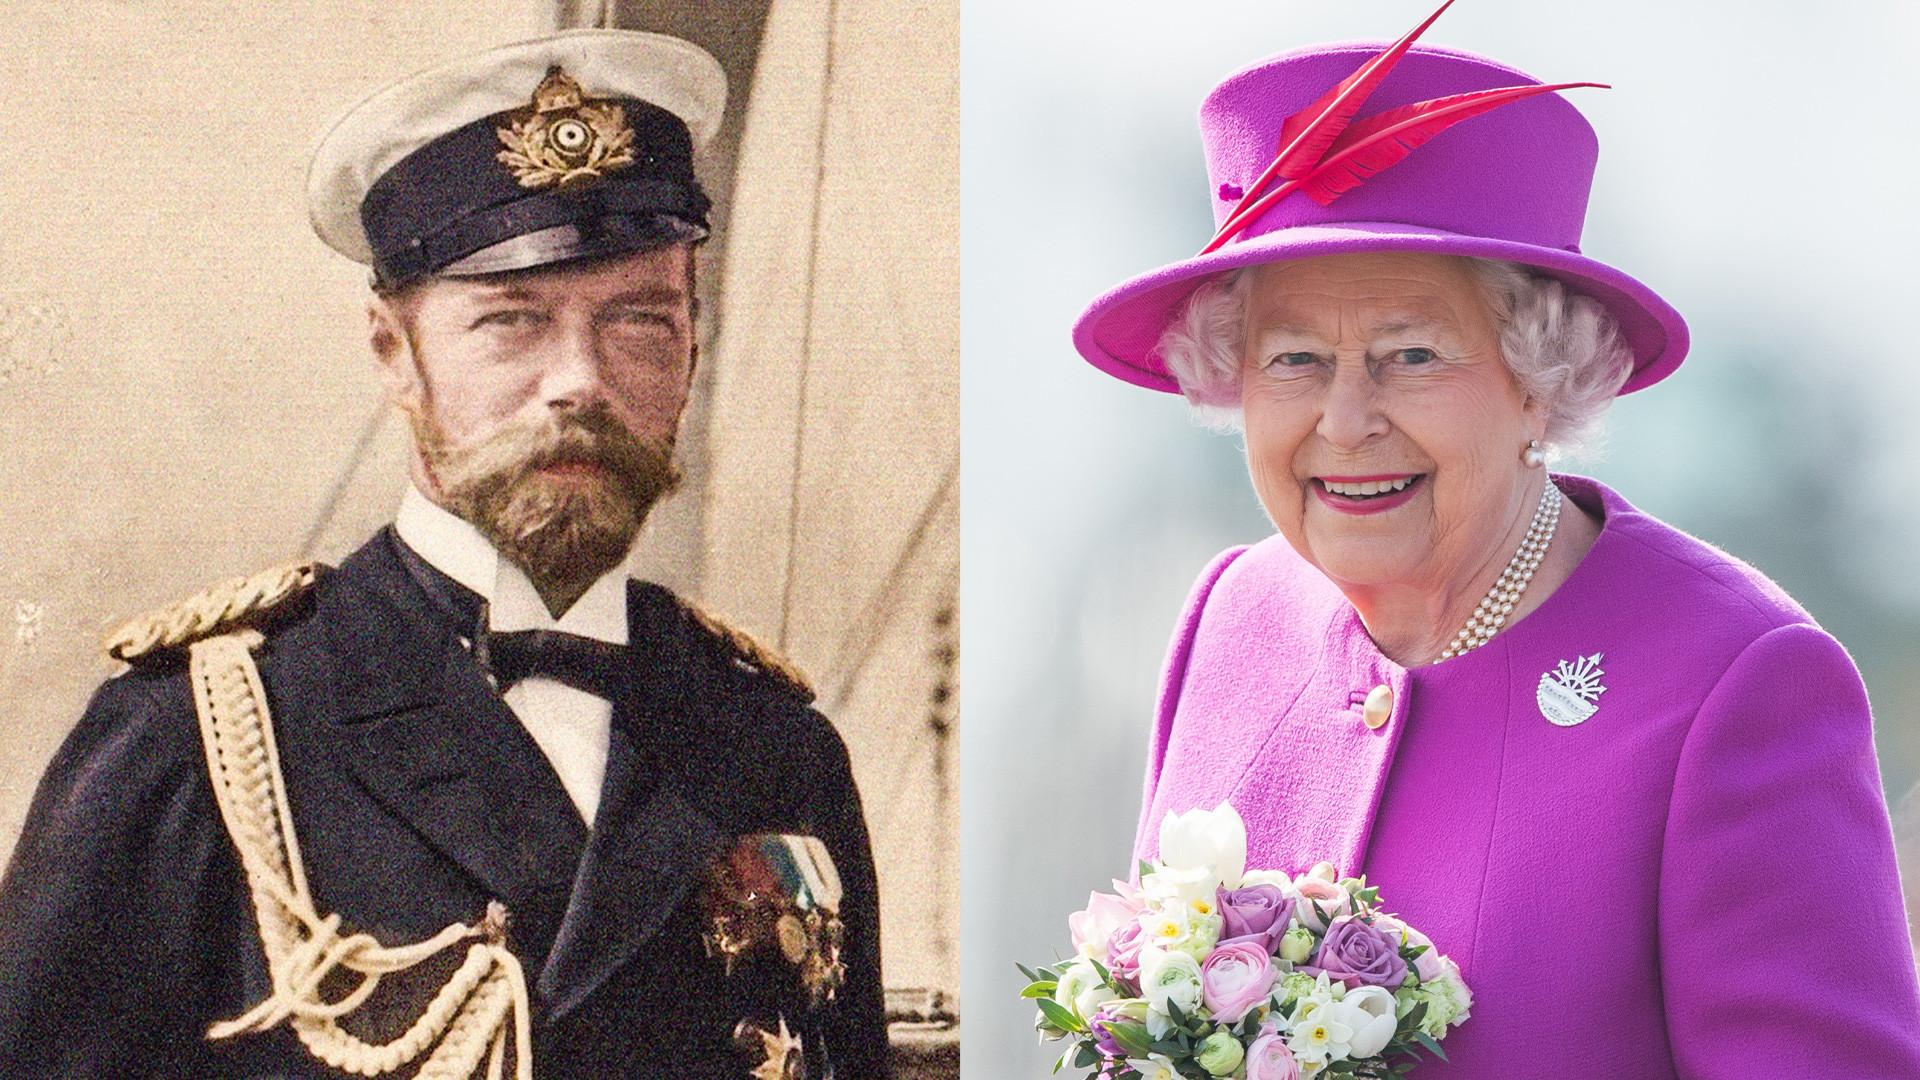 Le dernier empereur russe Nicolas II et la reine Élisabeth II